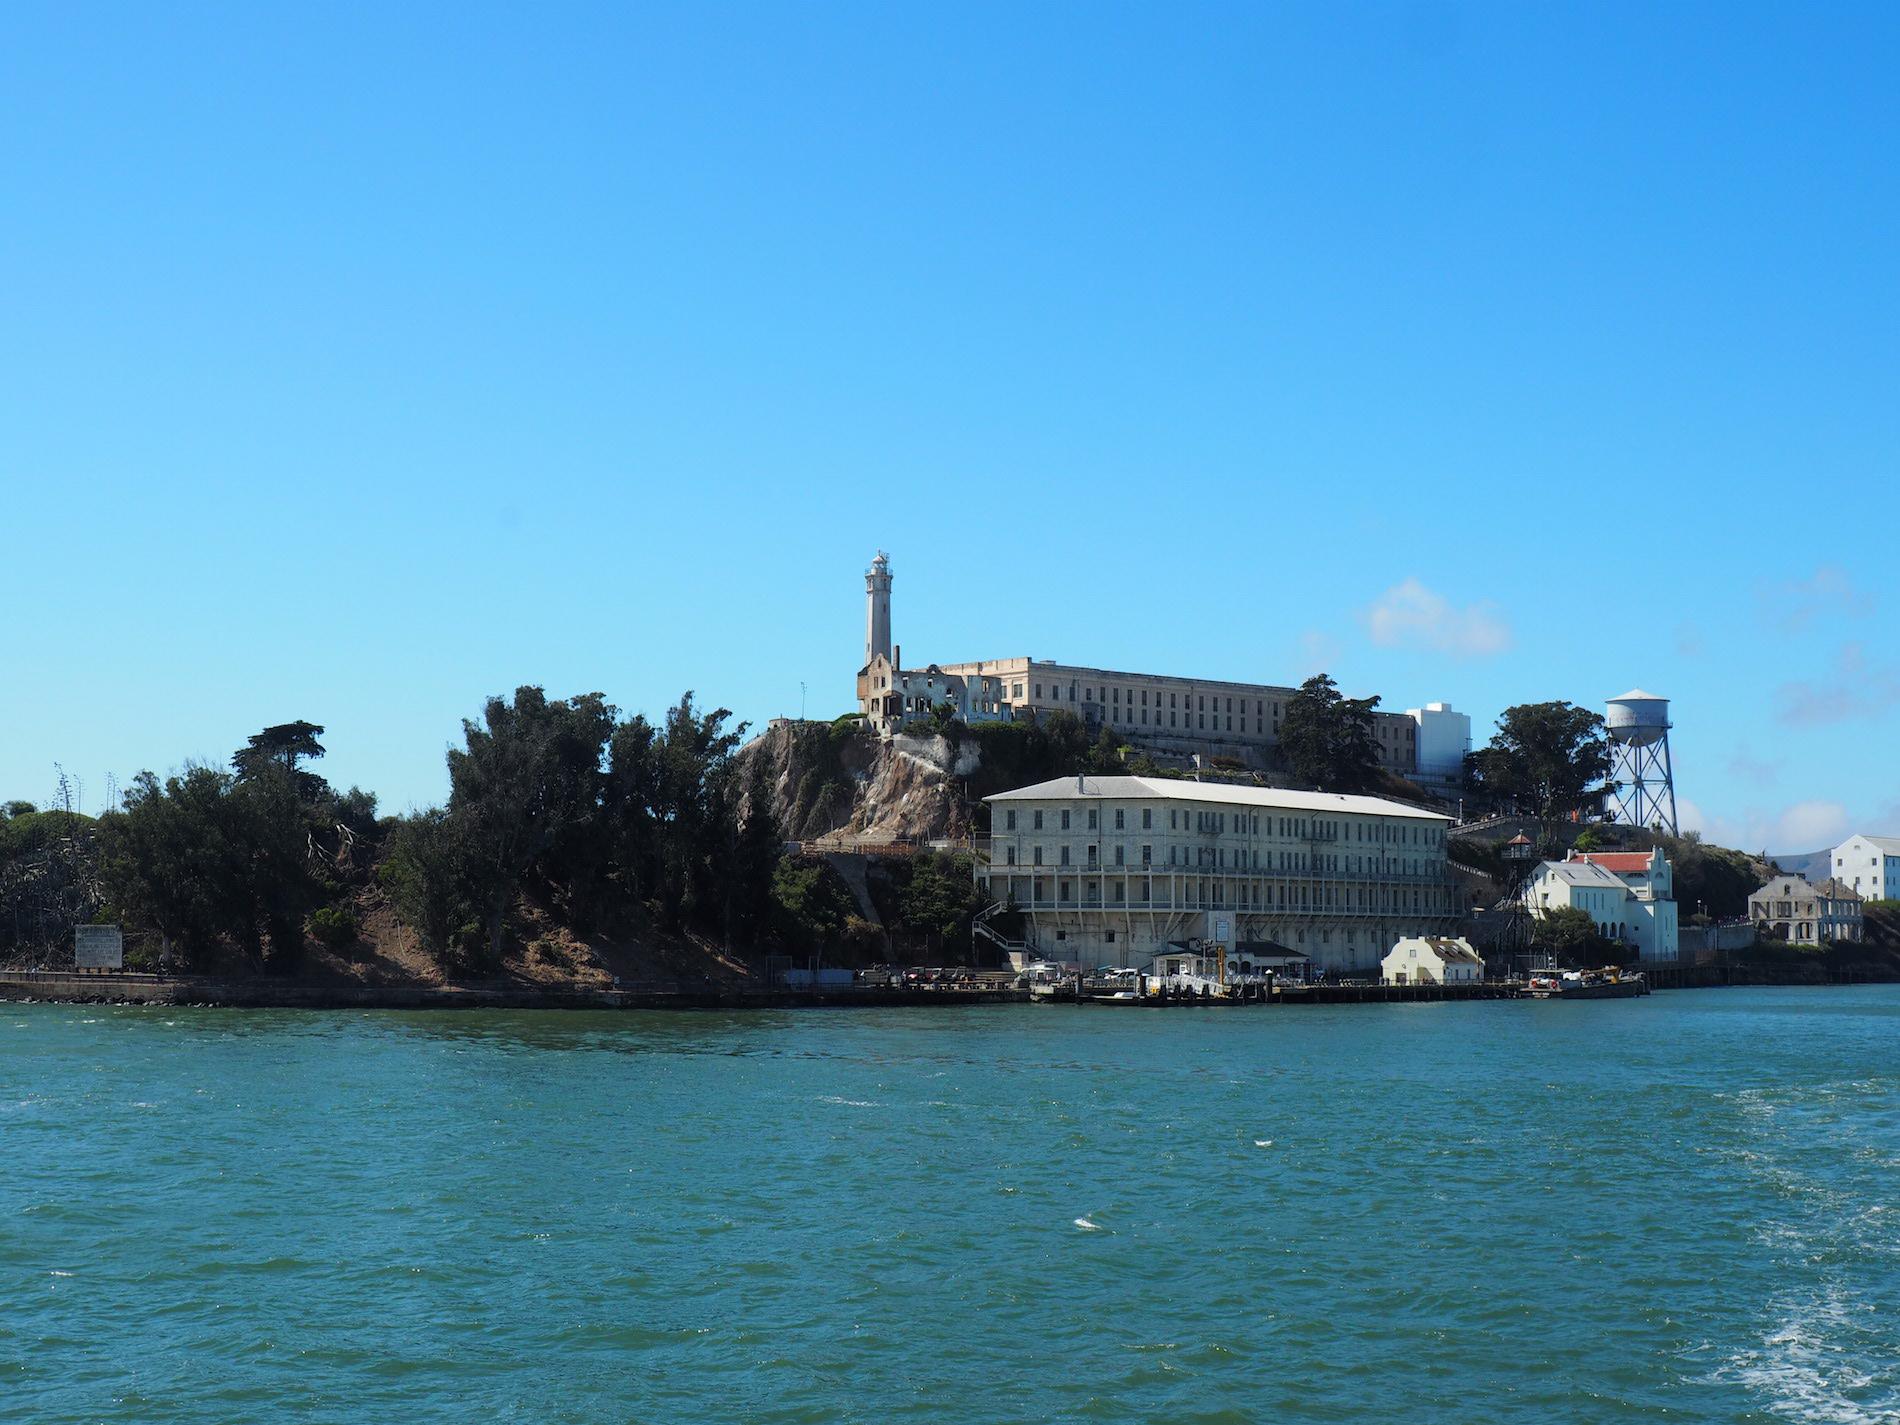 SanFrancisco-Alcatraz-Islanc